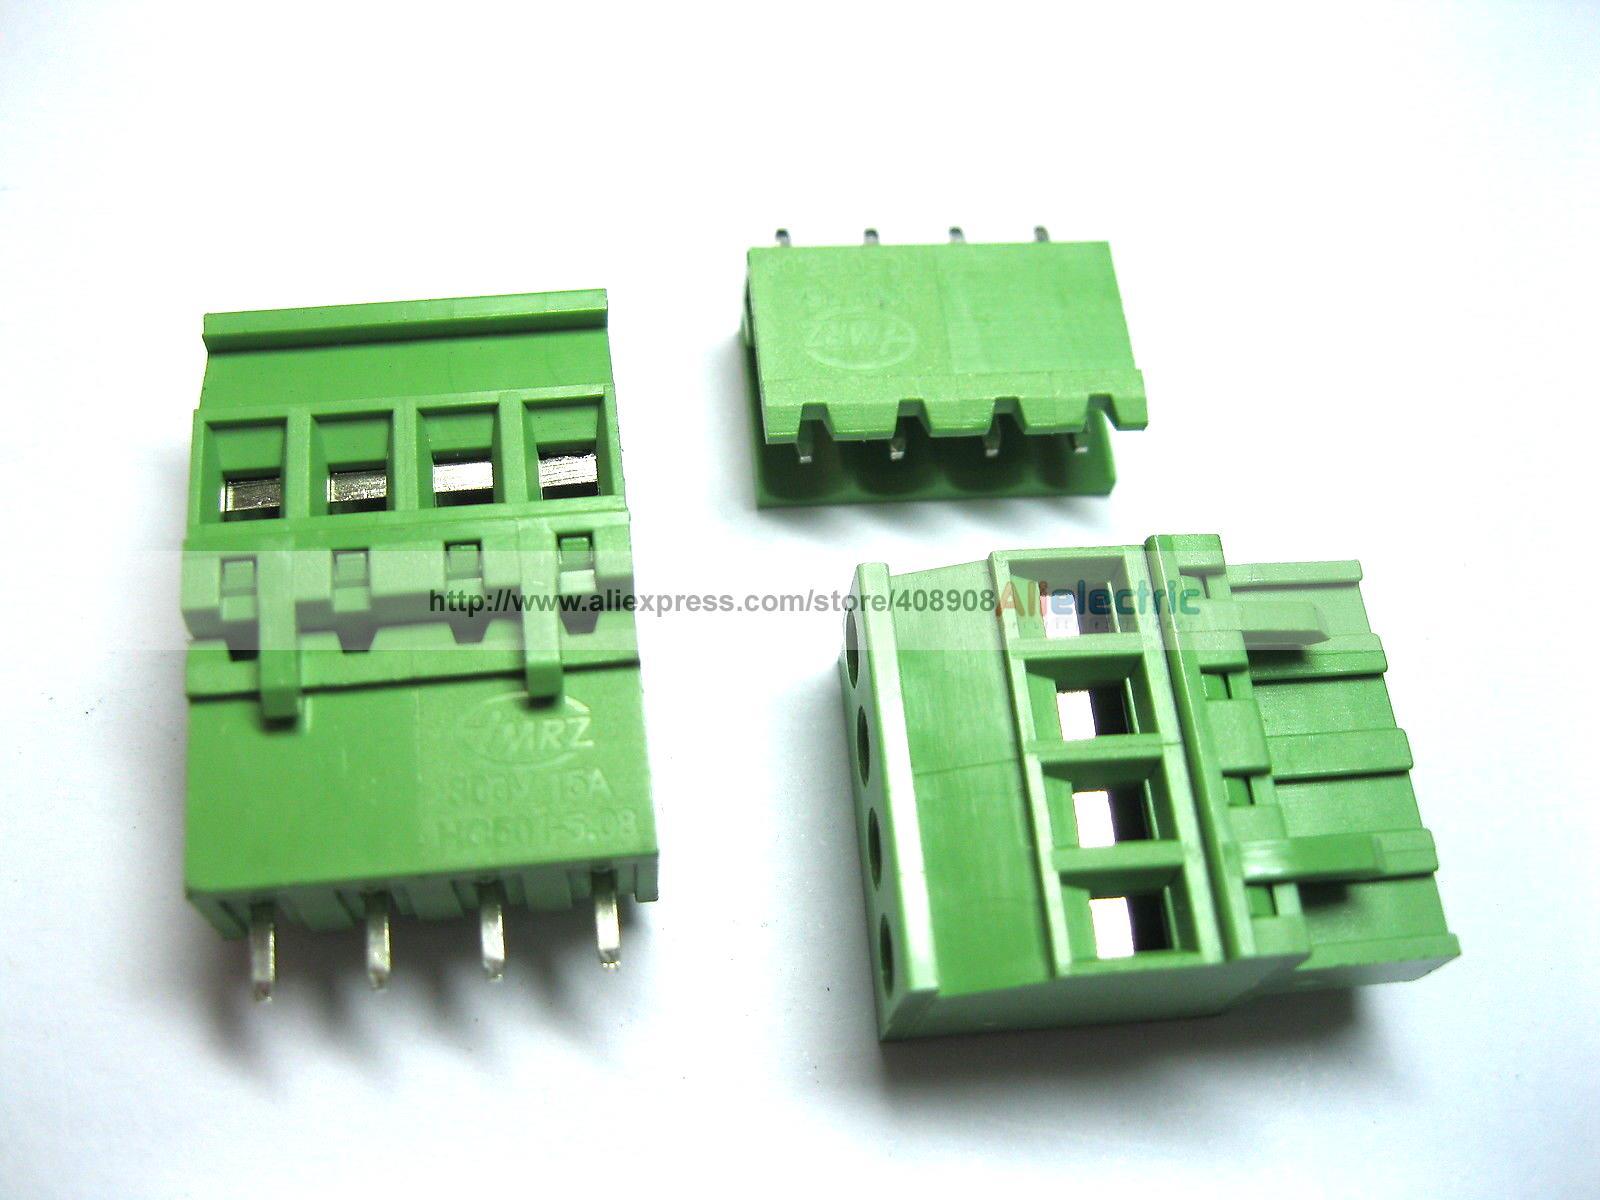 120 Pcs 5.08A 5.08mm Straight 6 Pin Screw Terminal Block Connector Pluggable 6 pin curved screw terminal block connectors green 10 piece pack